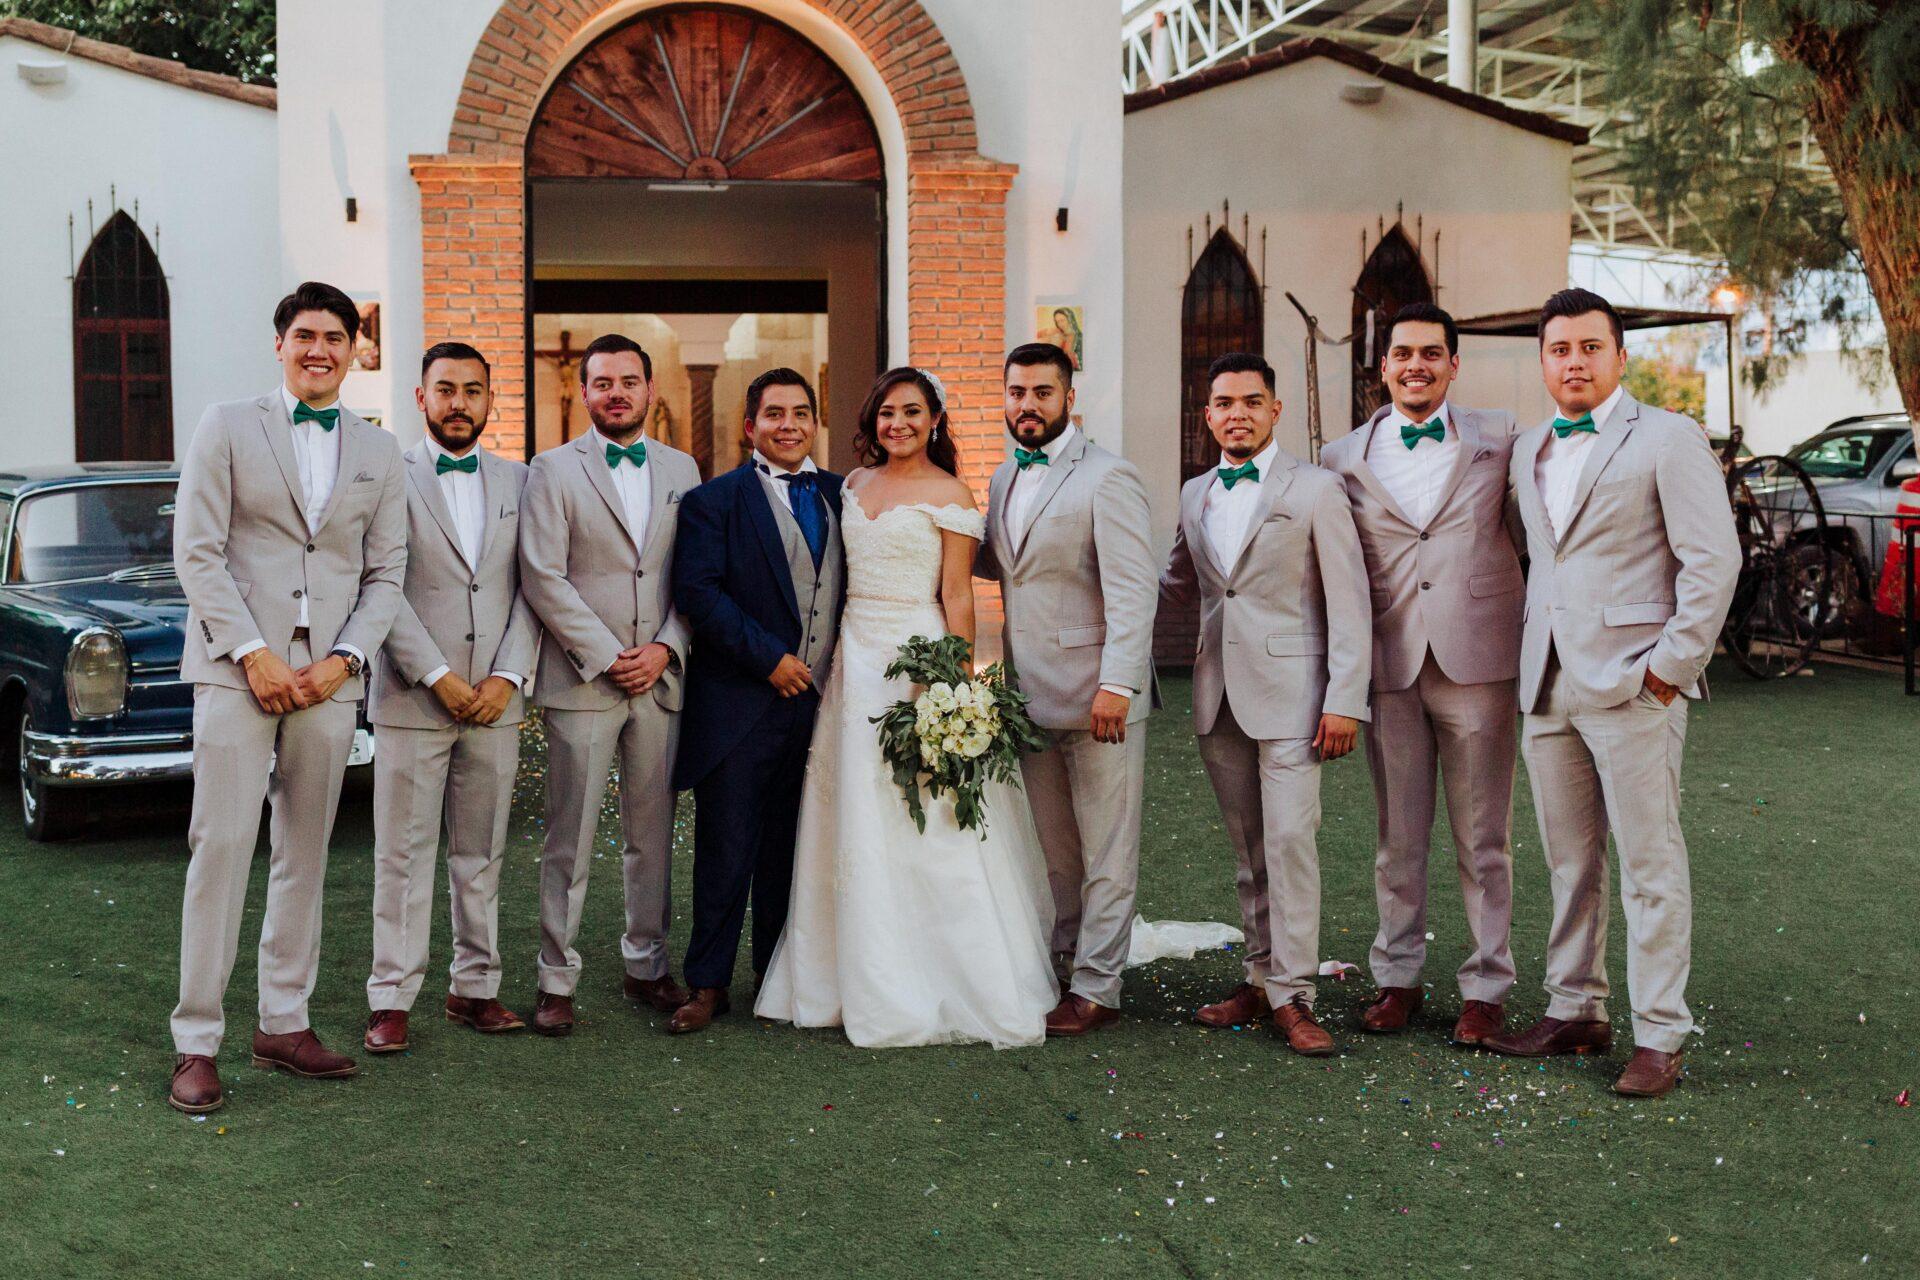 javier_noriega_fotografo_bodas_torreon_coahuila_zacatecas_wedding_photographer51a